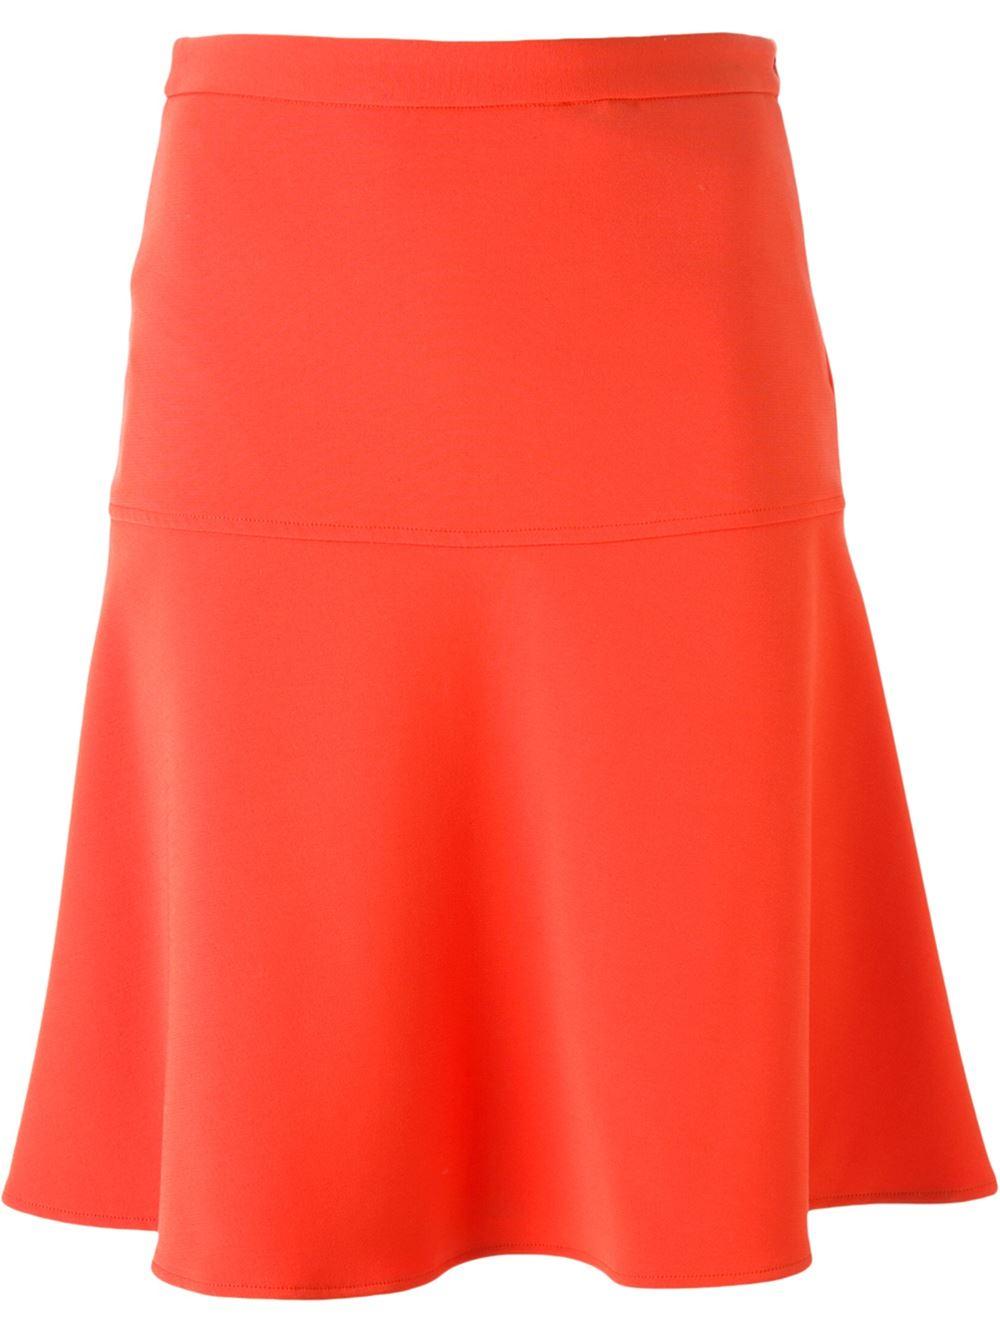 Michael michael kors Flared A-line Skirt in Orange | Lyst